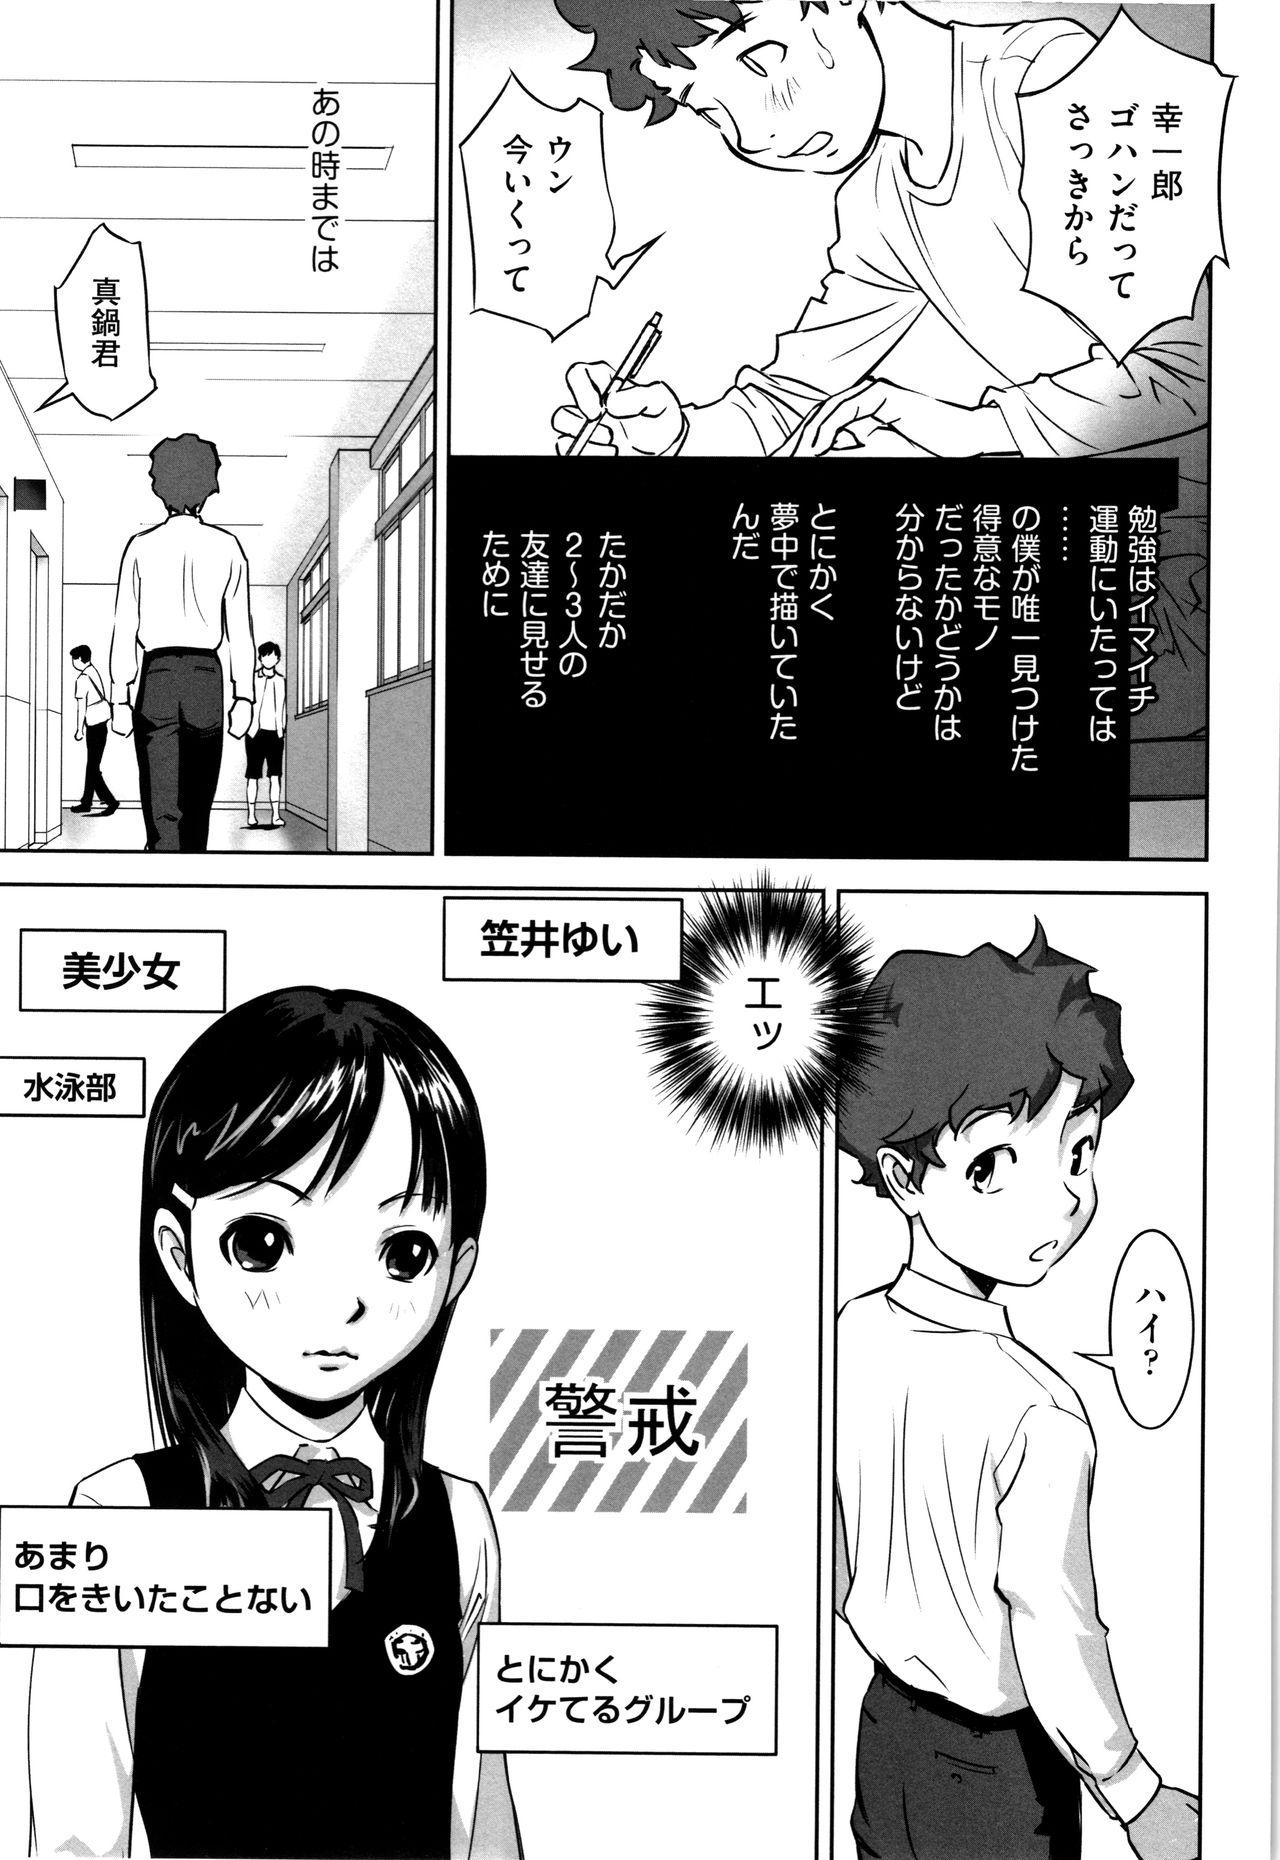 Shoujo Kumikyoku 7 37